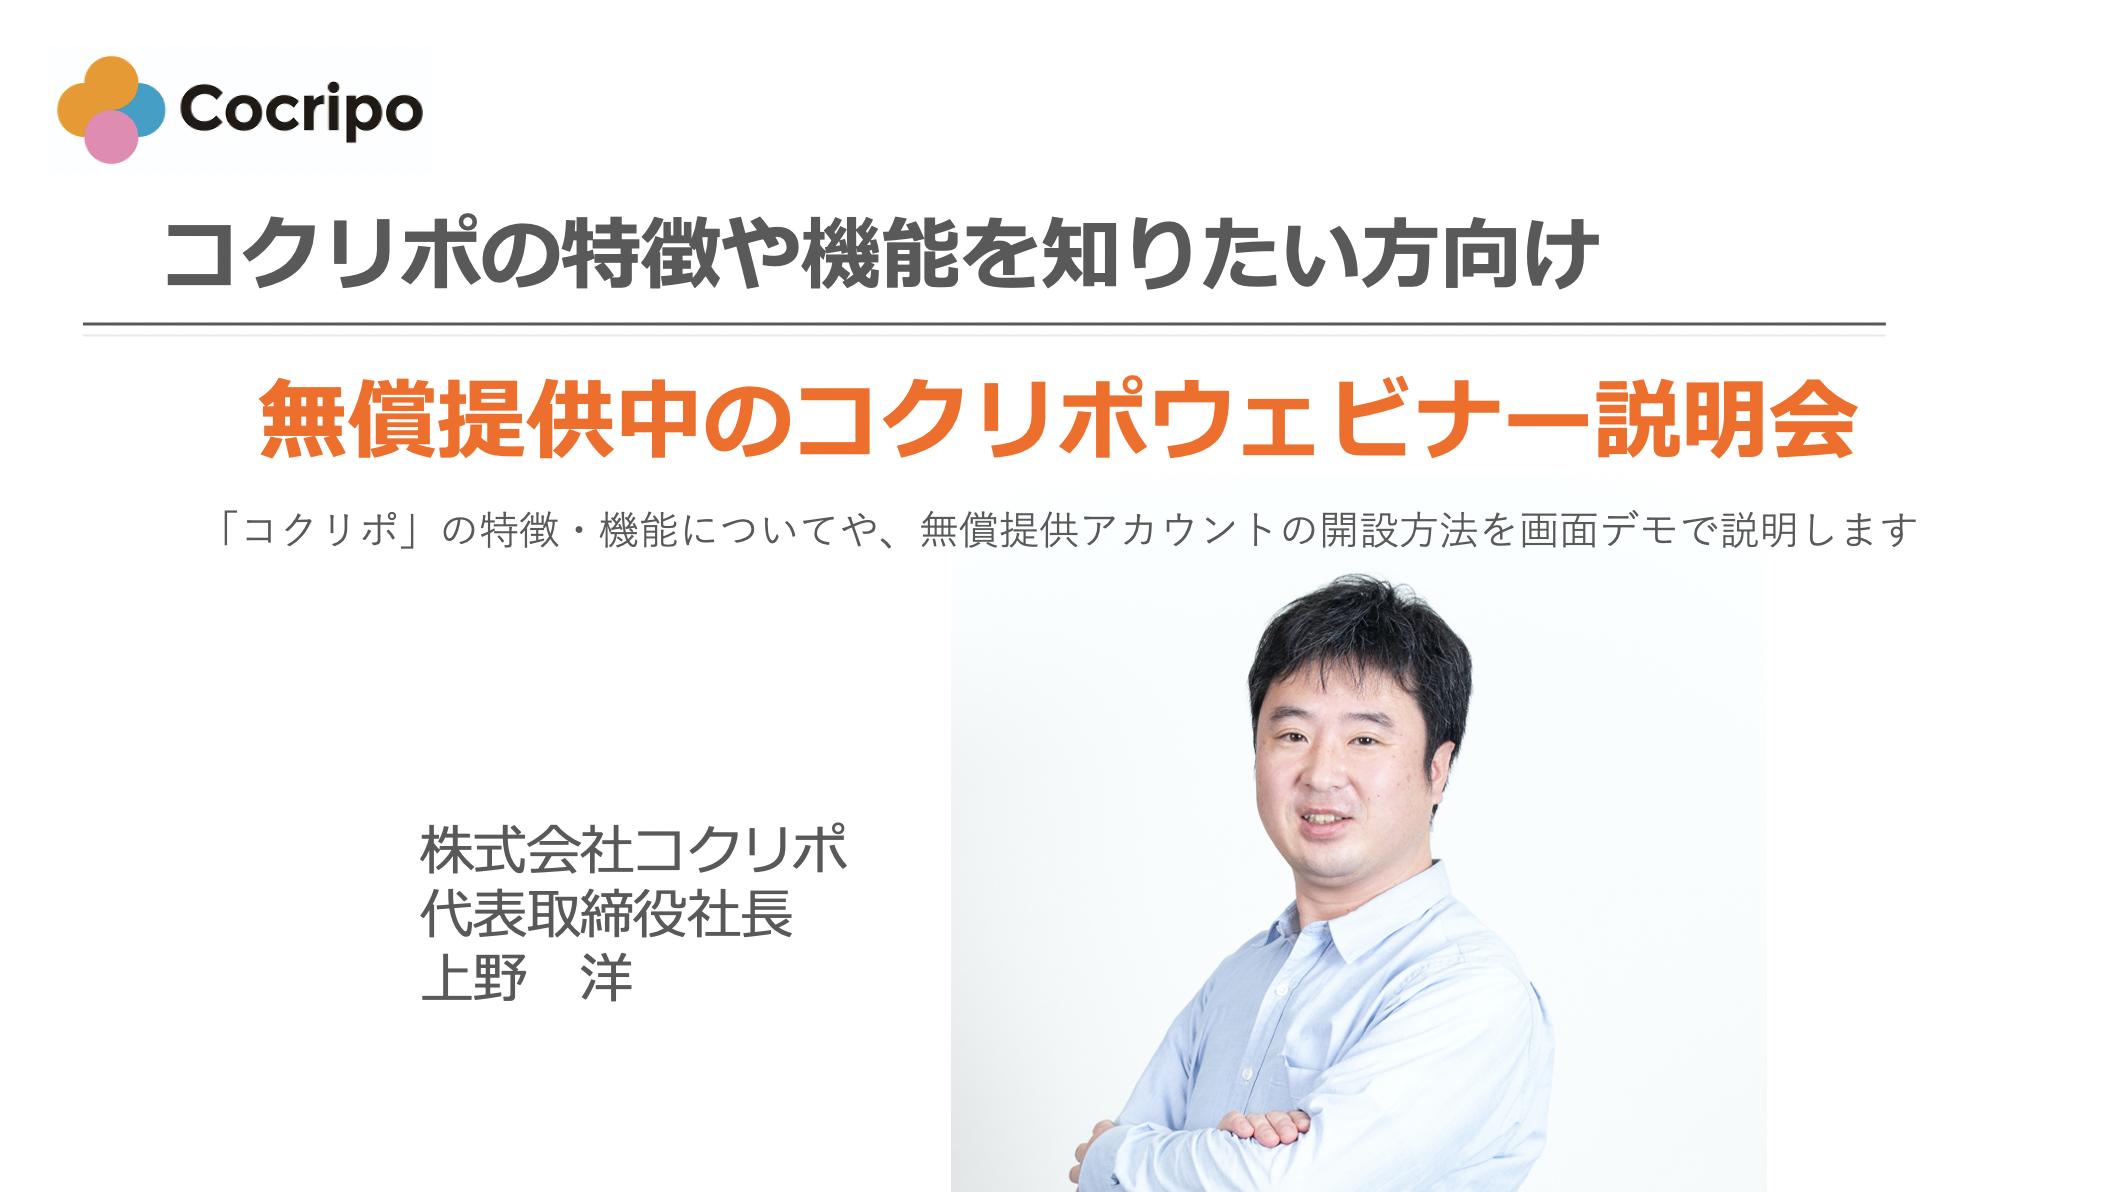 【ferret読者様限定】『コクリポ』オンライン説明会